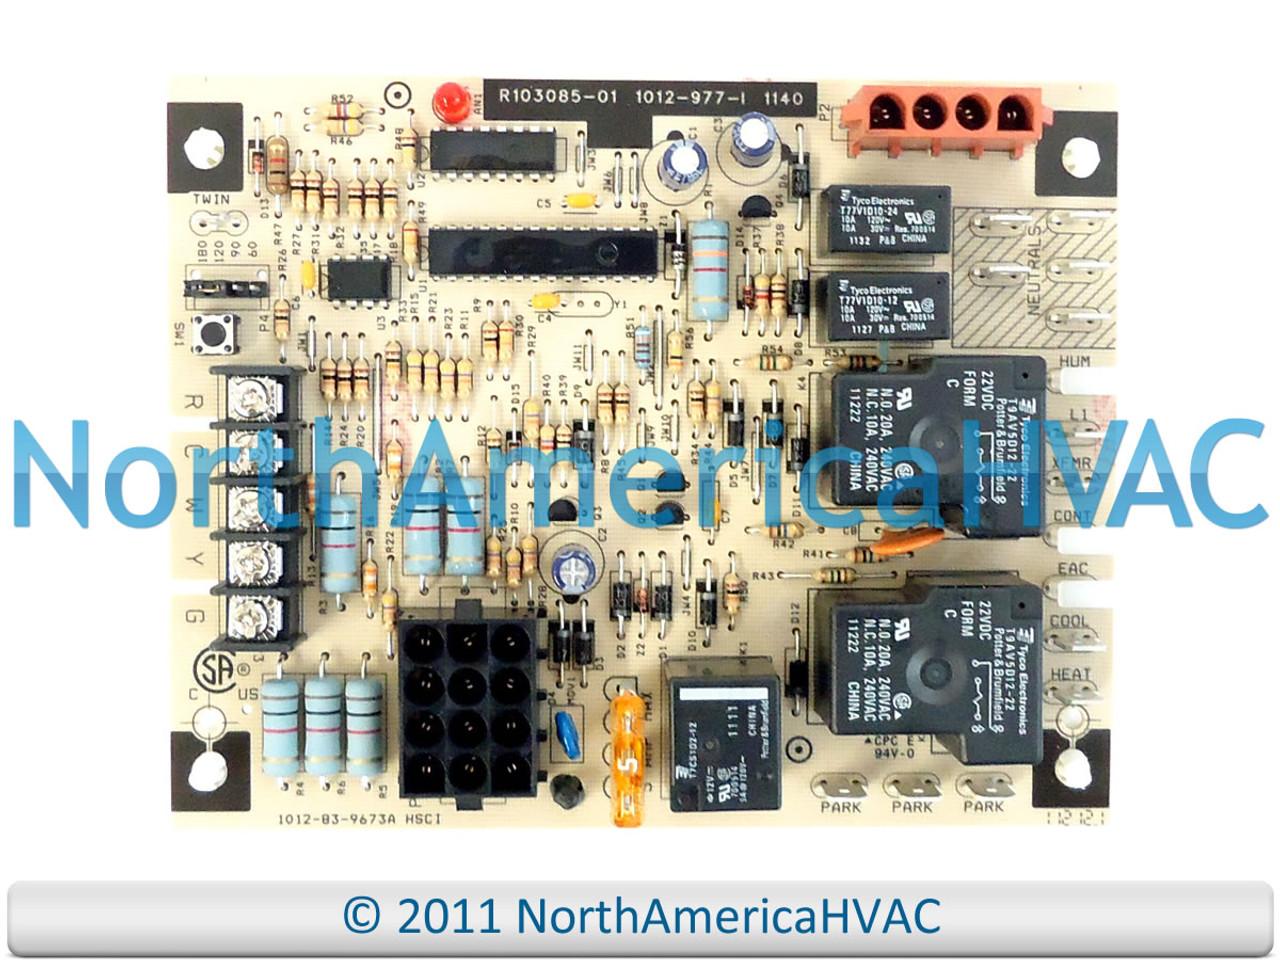 Tools & Home Improvement Ducane OEM Replacement Furnace Control ...